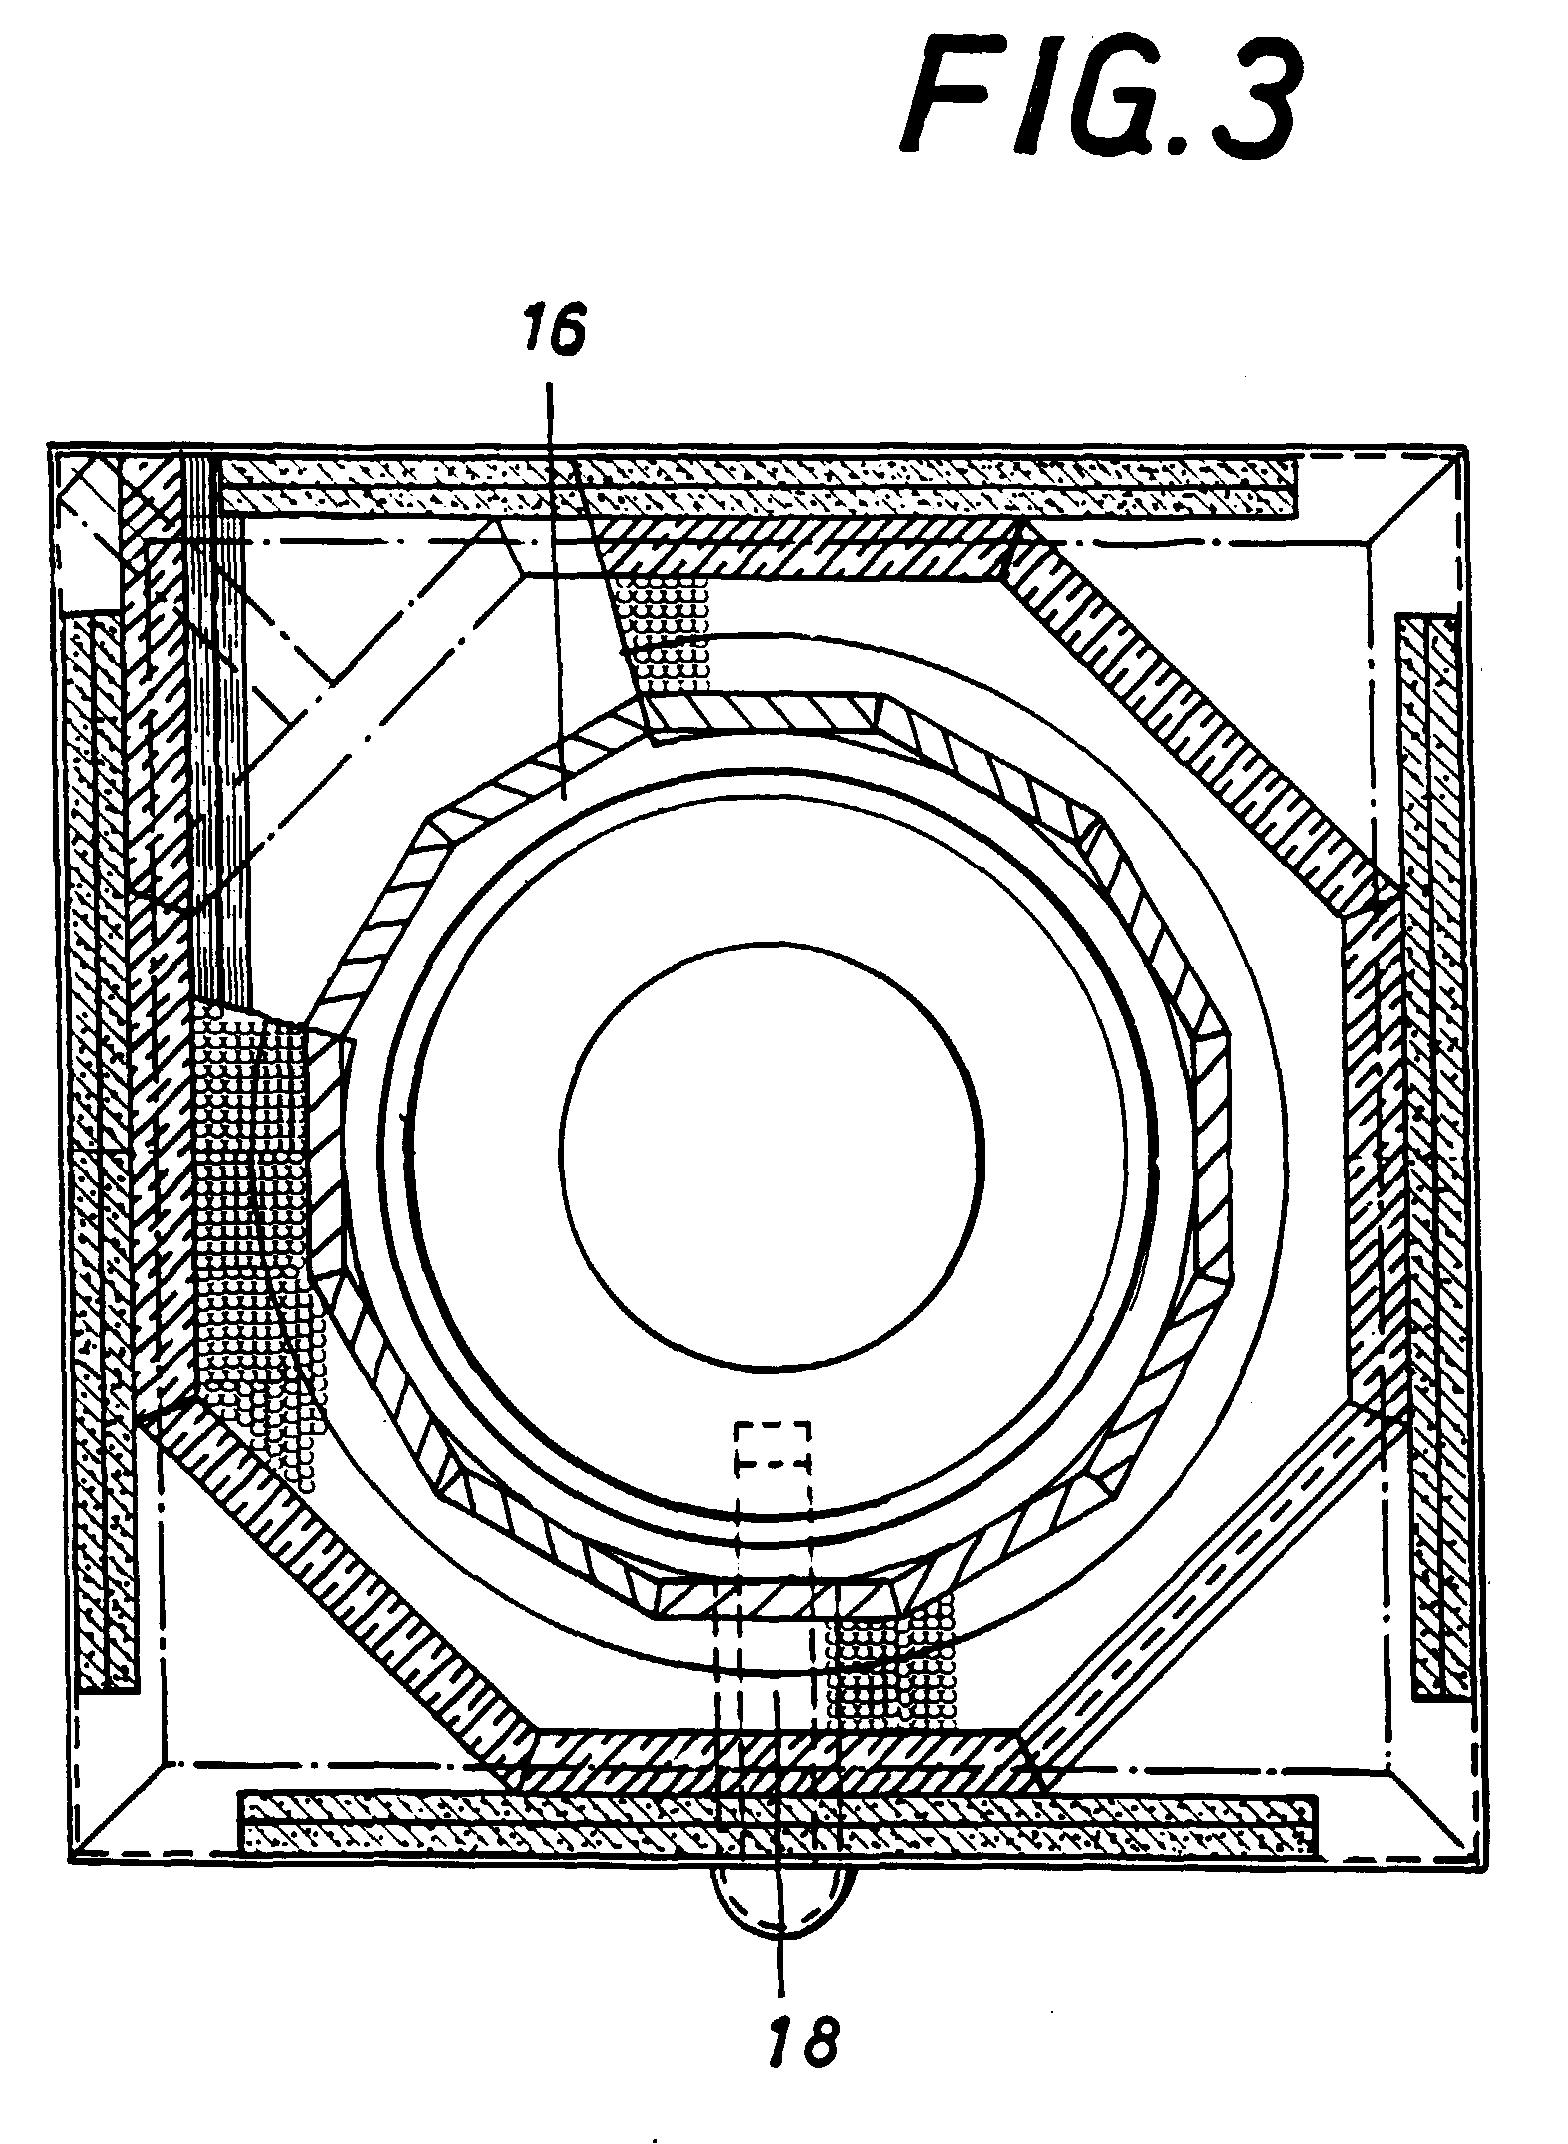 Underground Well Pressure Tank Diagram Wiring And Engine Diagram